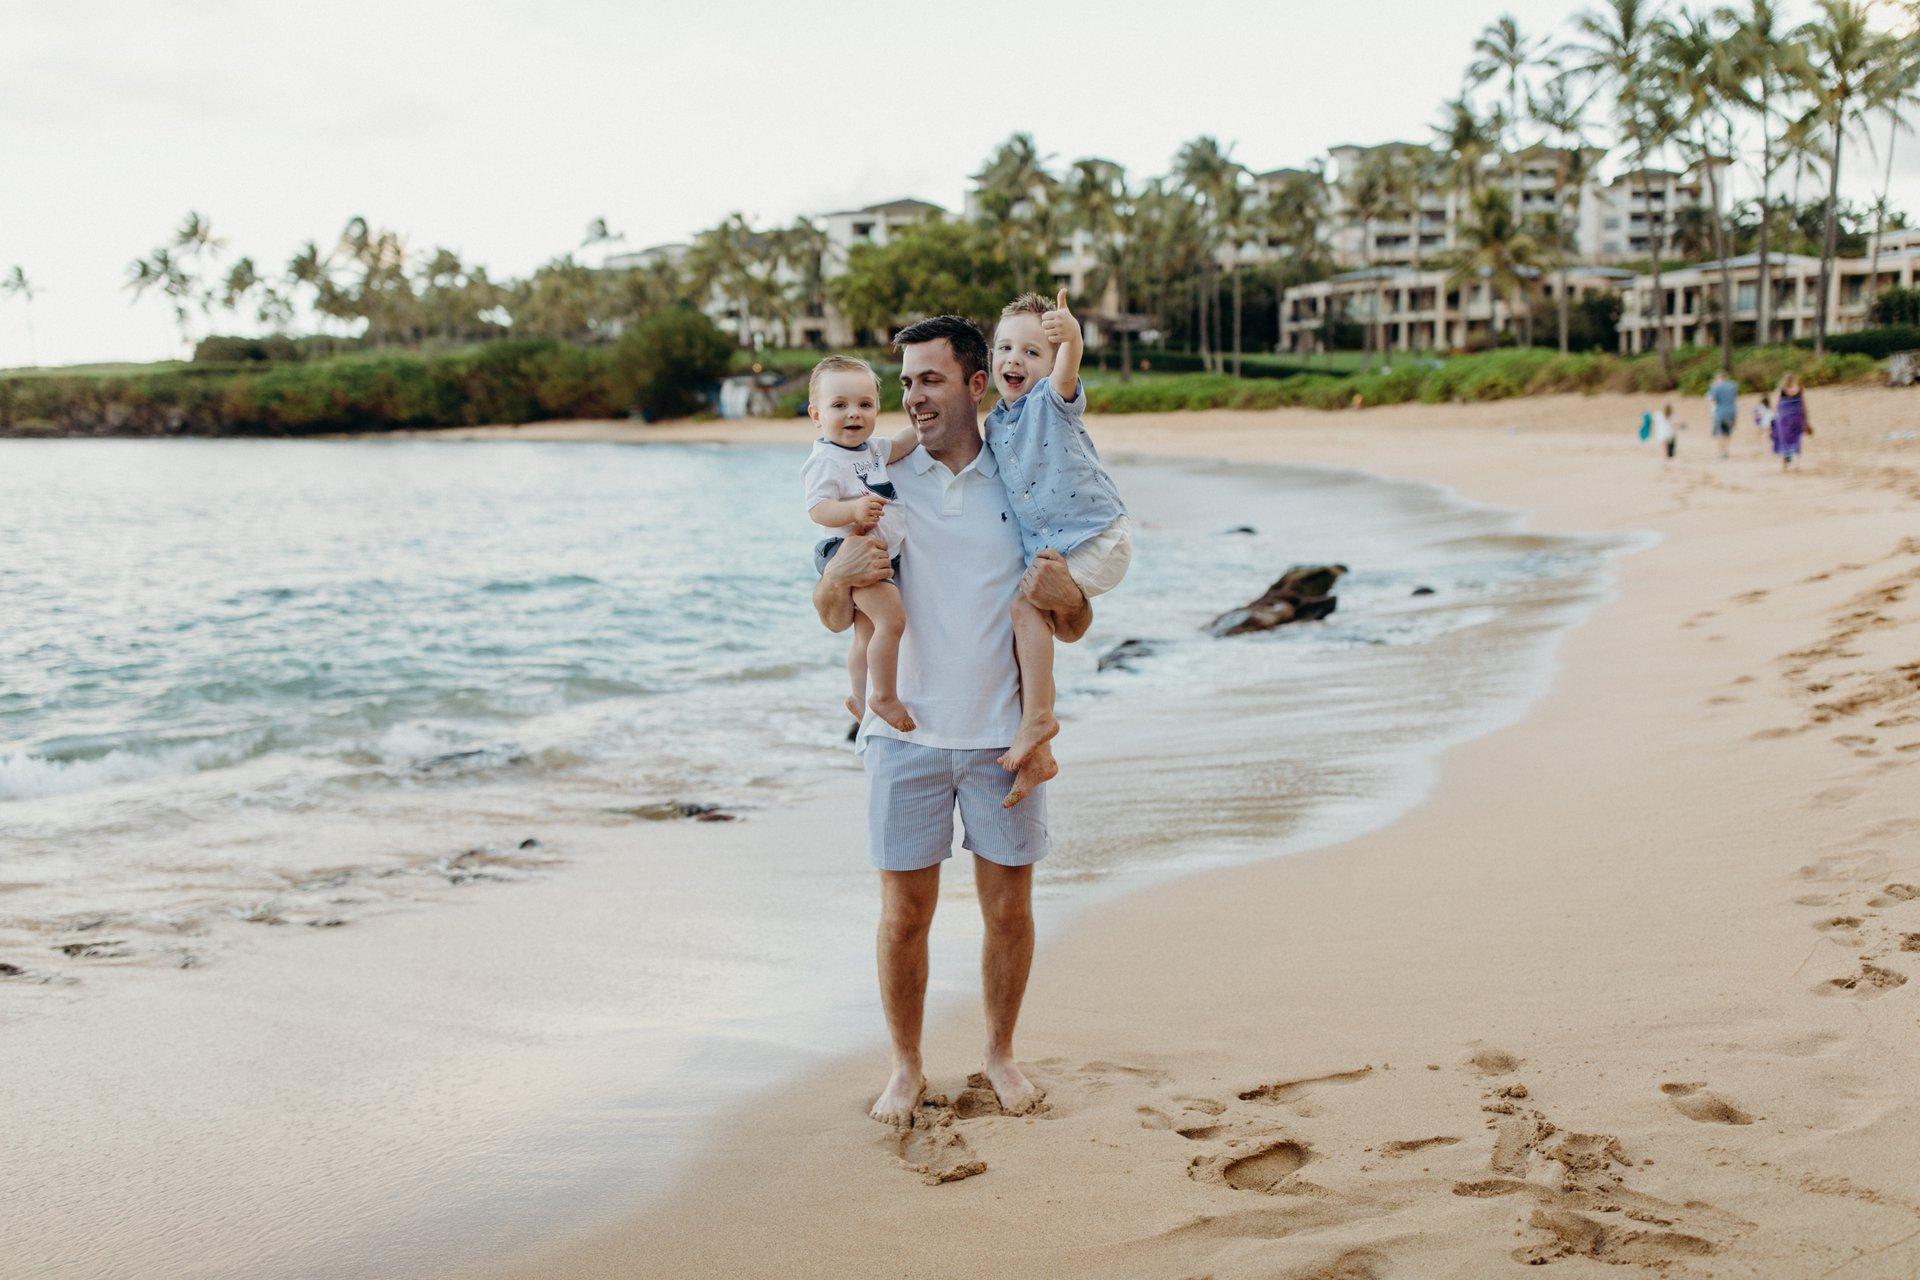 Maui-USA-travel-story-Flytographer-29